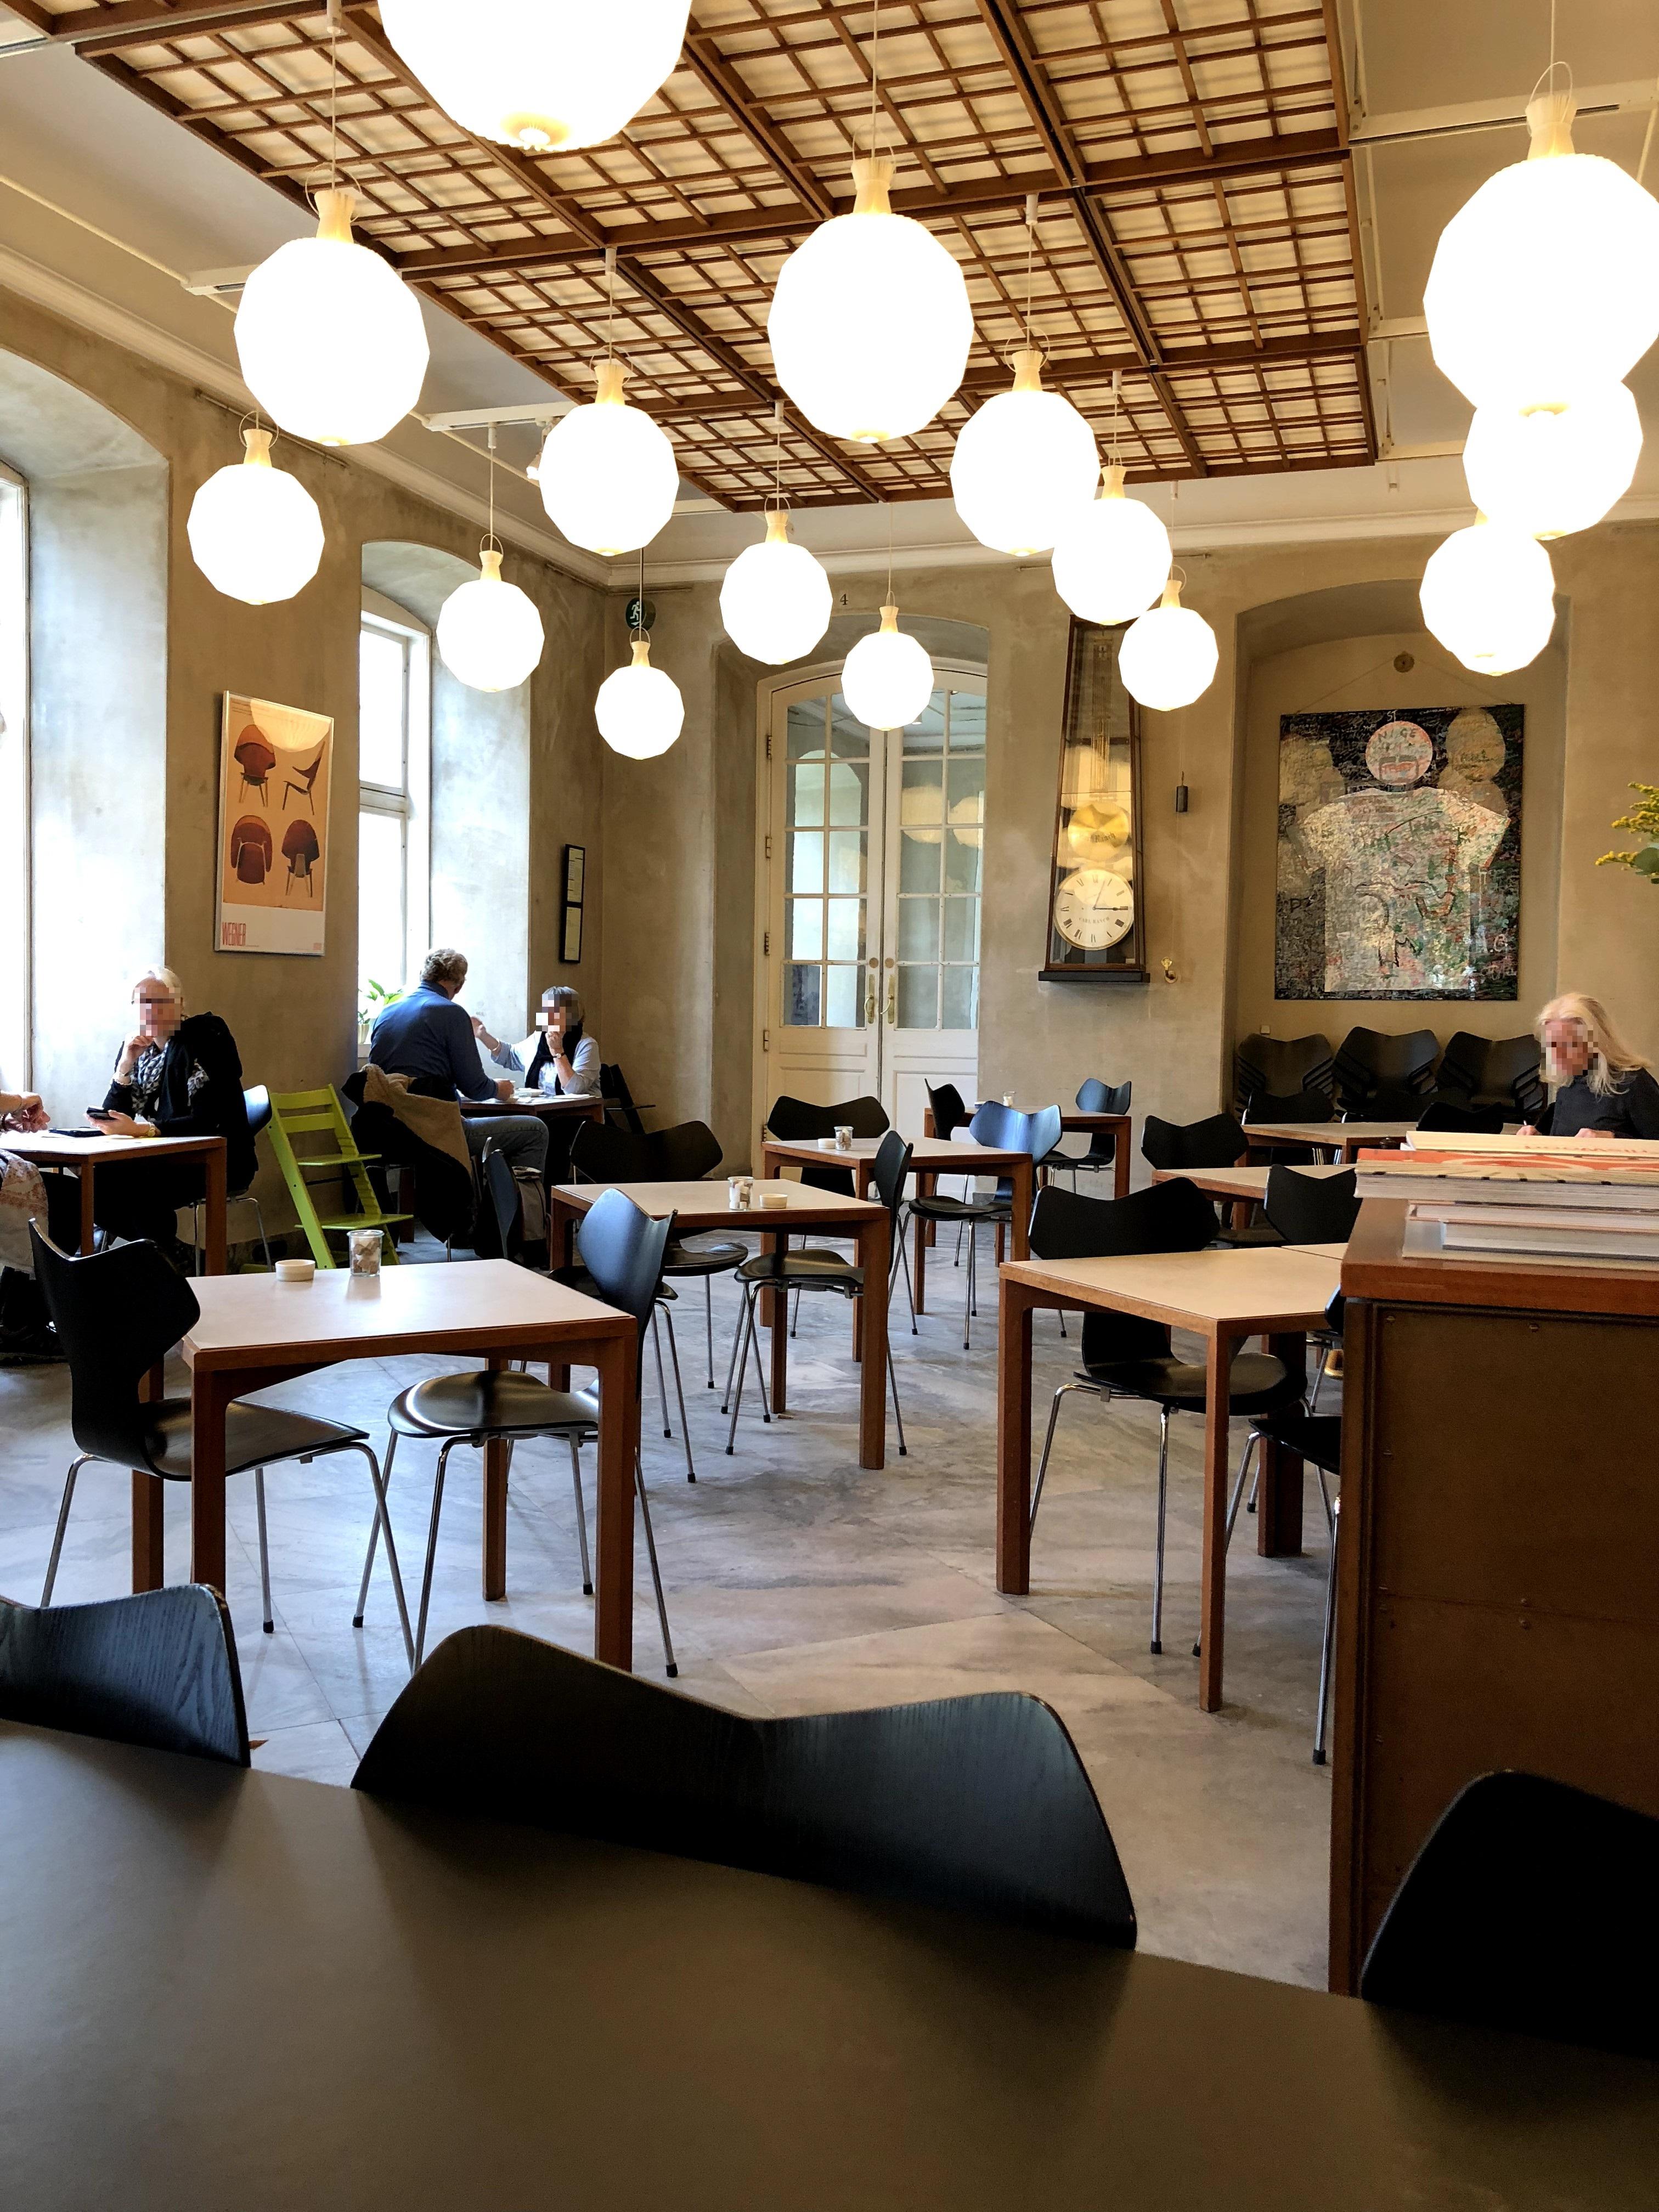 "Denmark_designmuseum_cafe_002"""""